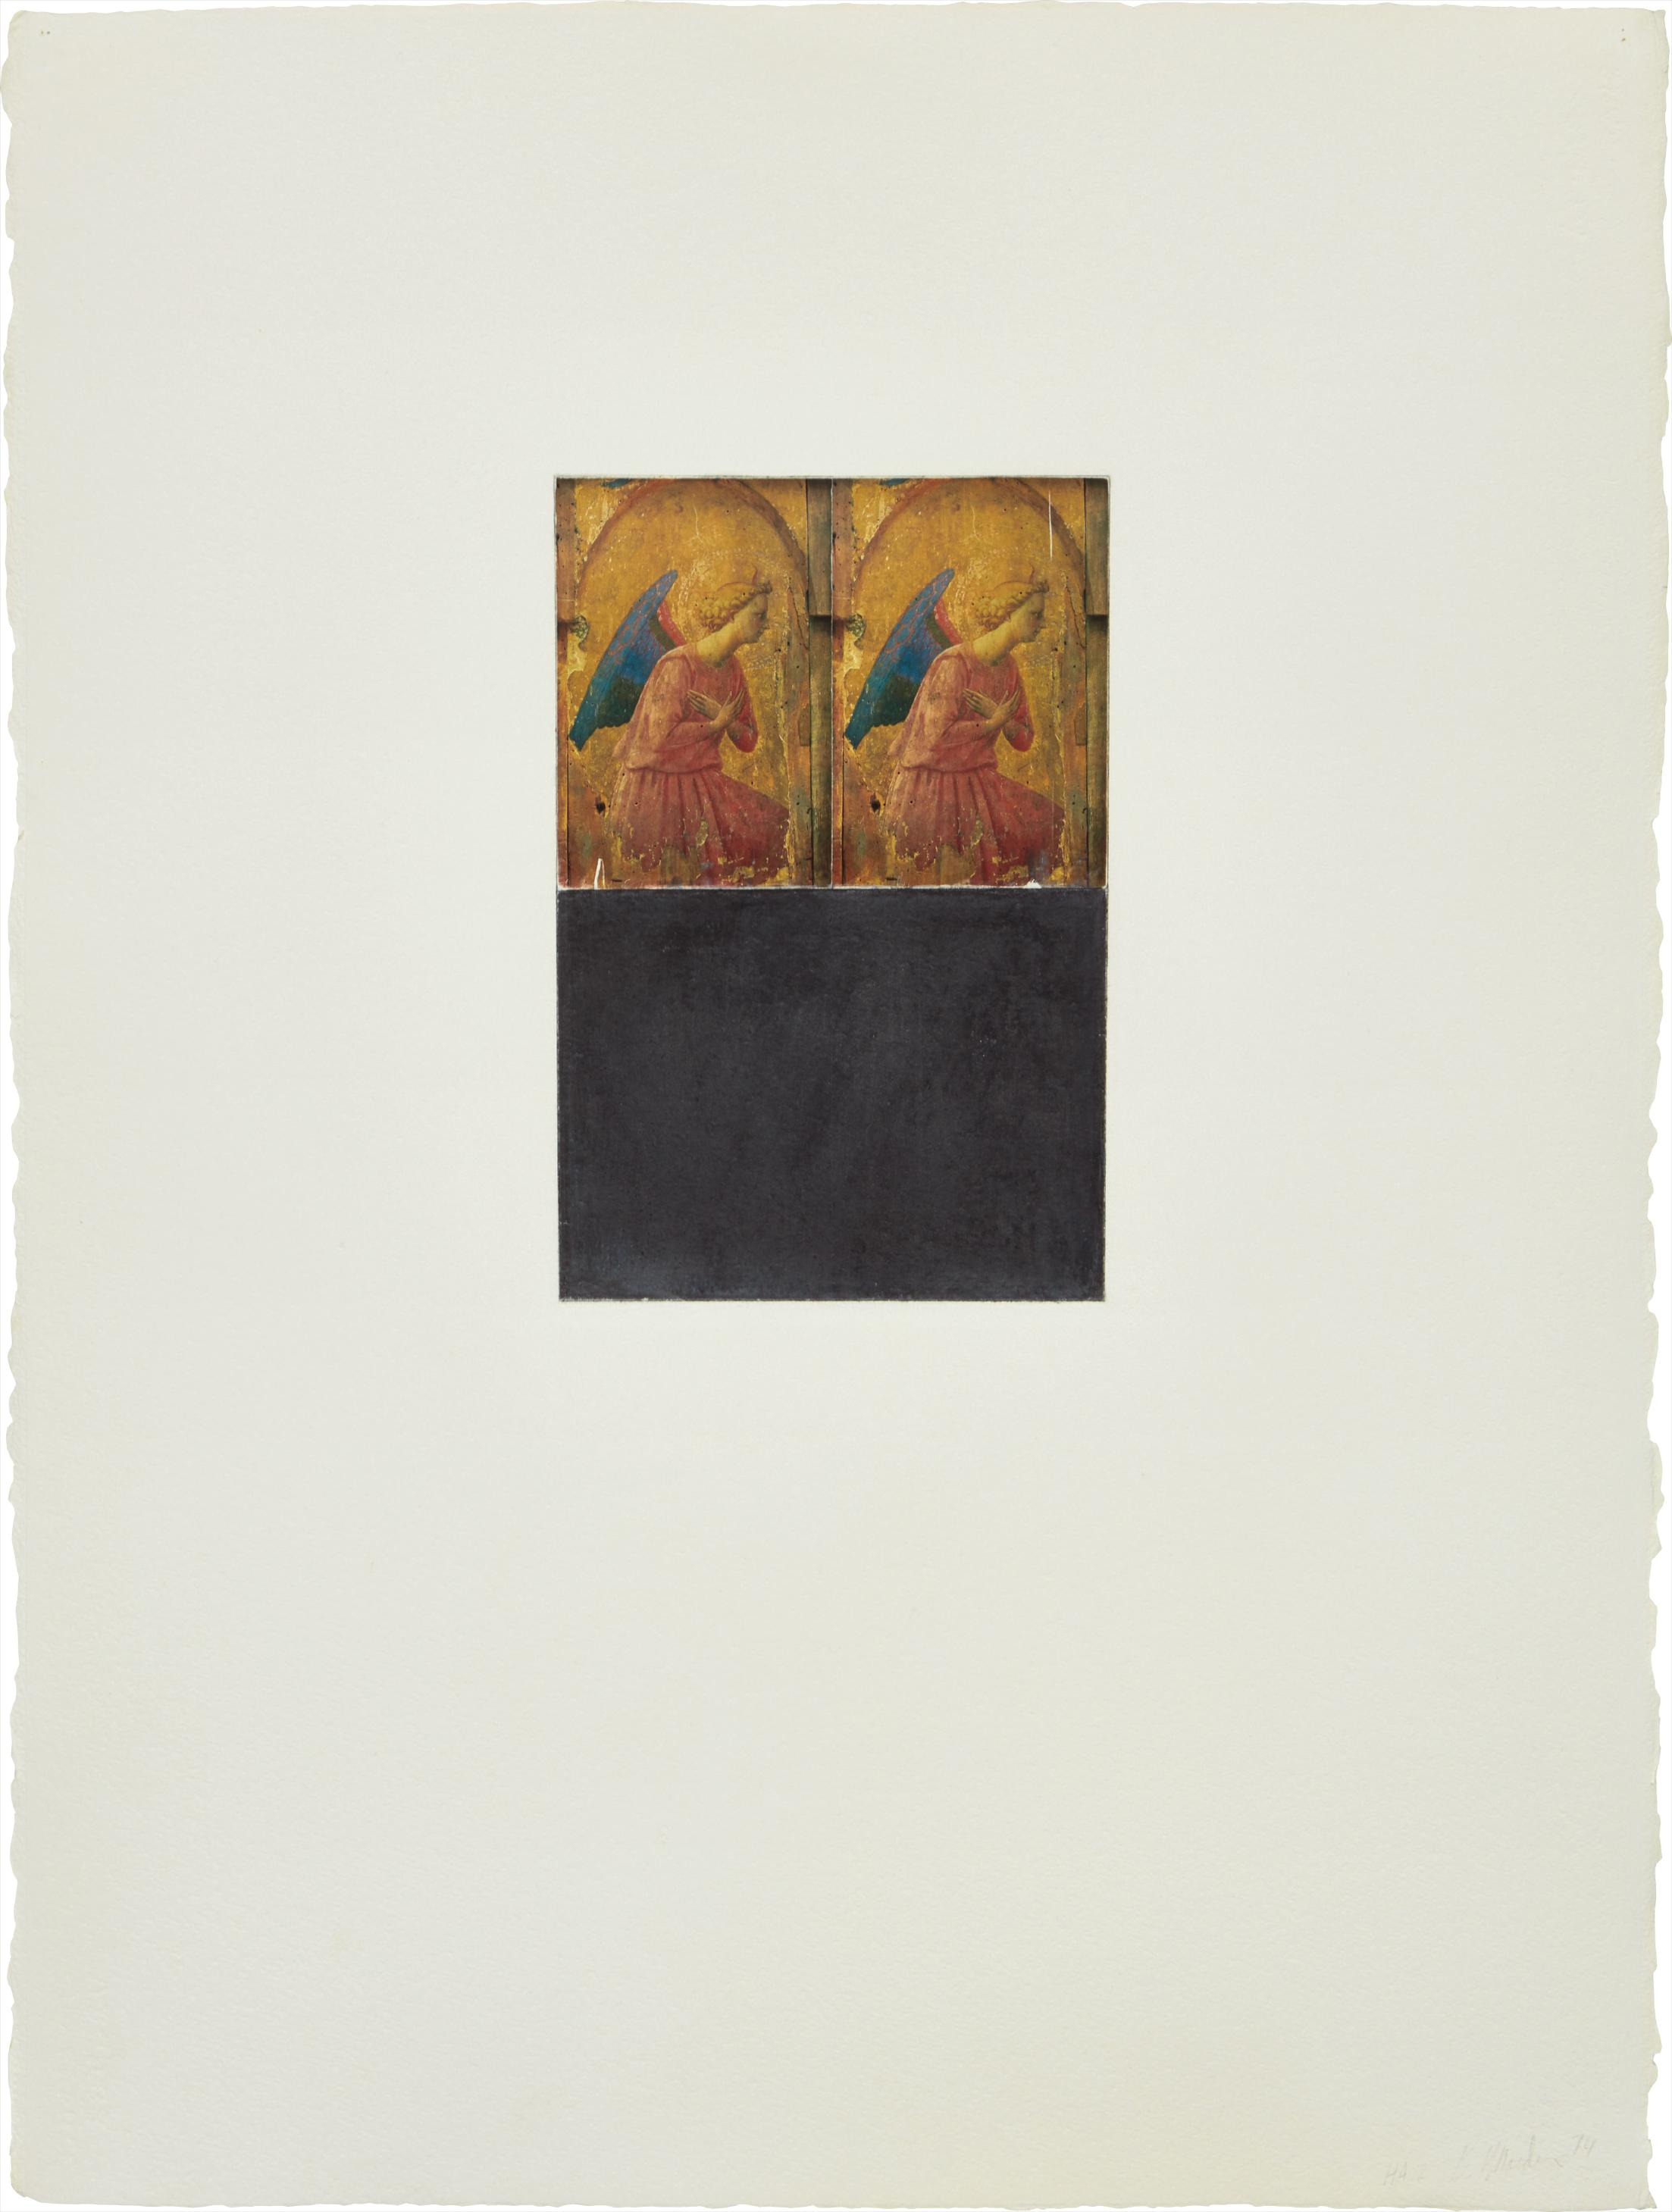 Brice Marden-Homage To Art 12-1974